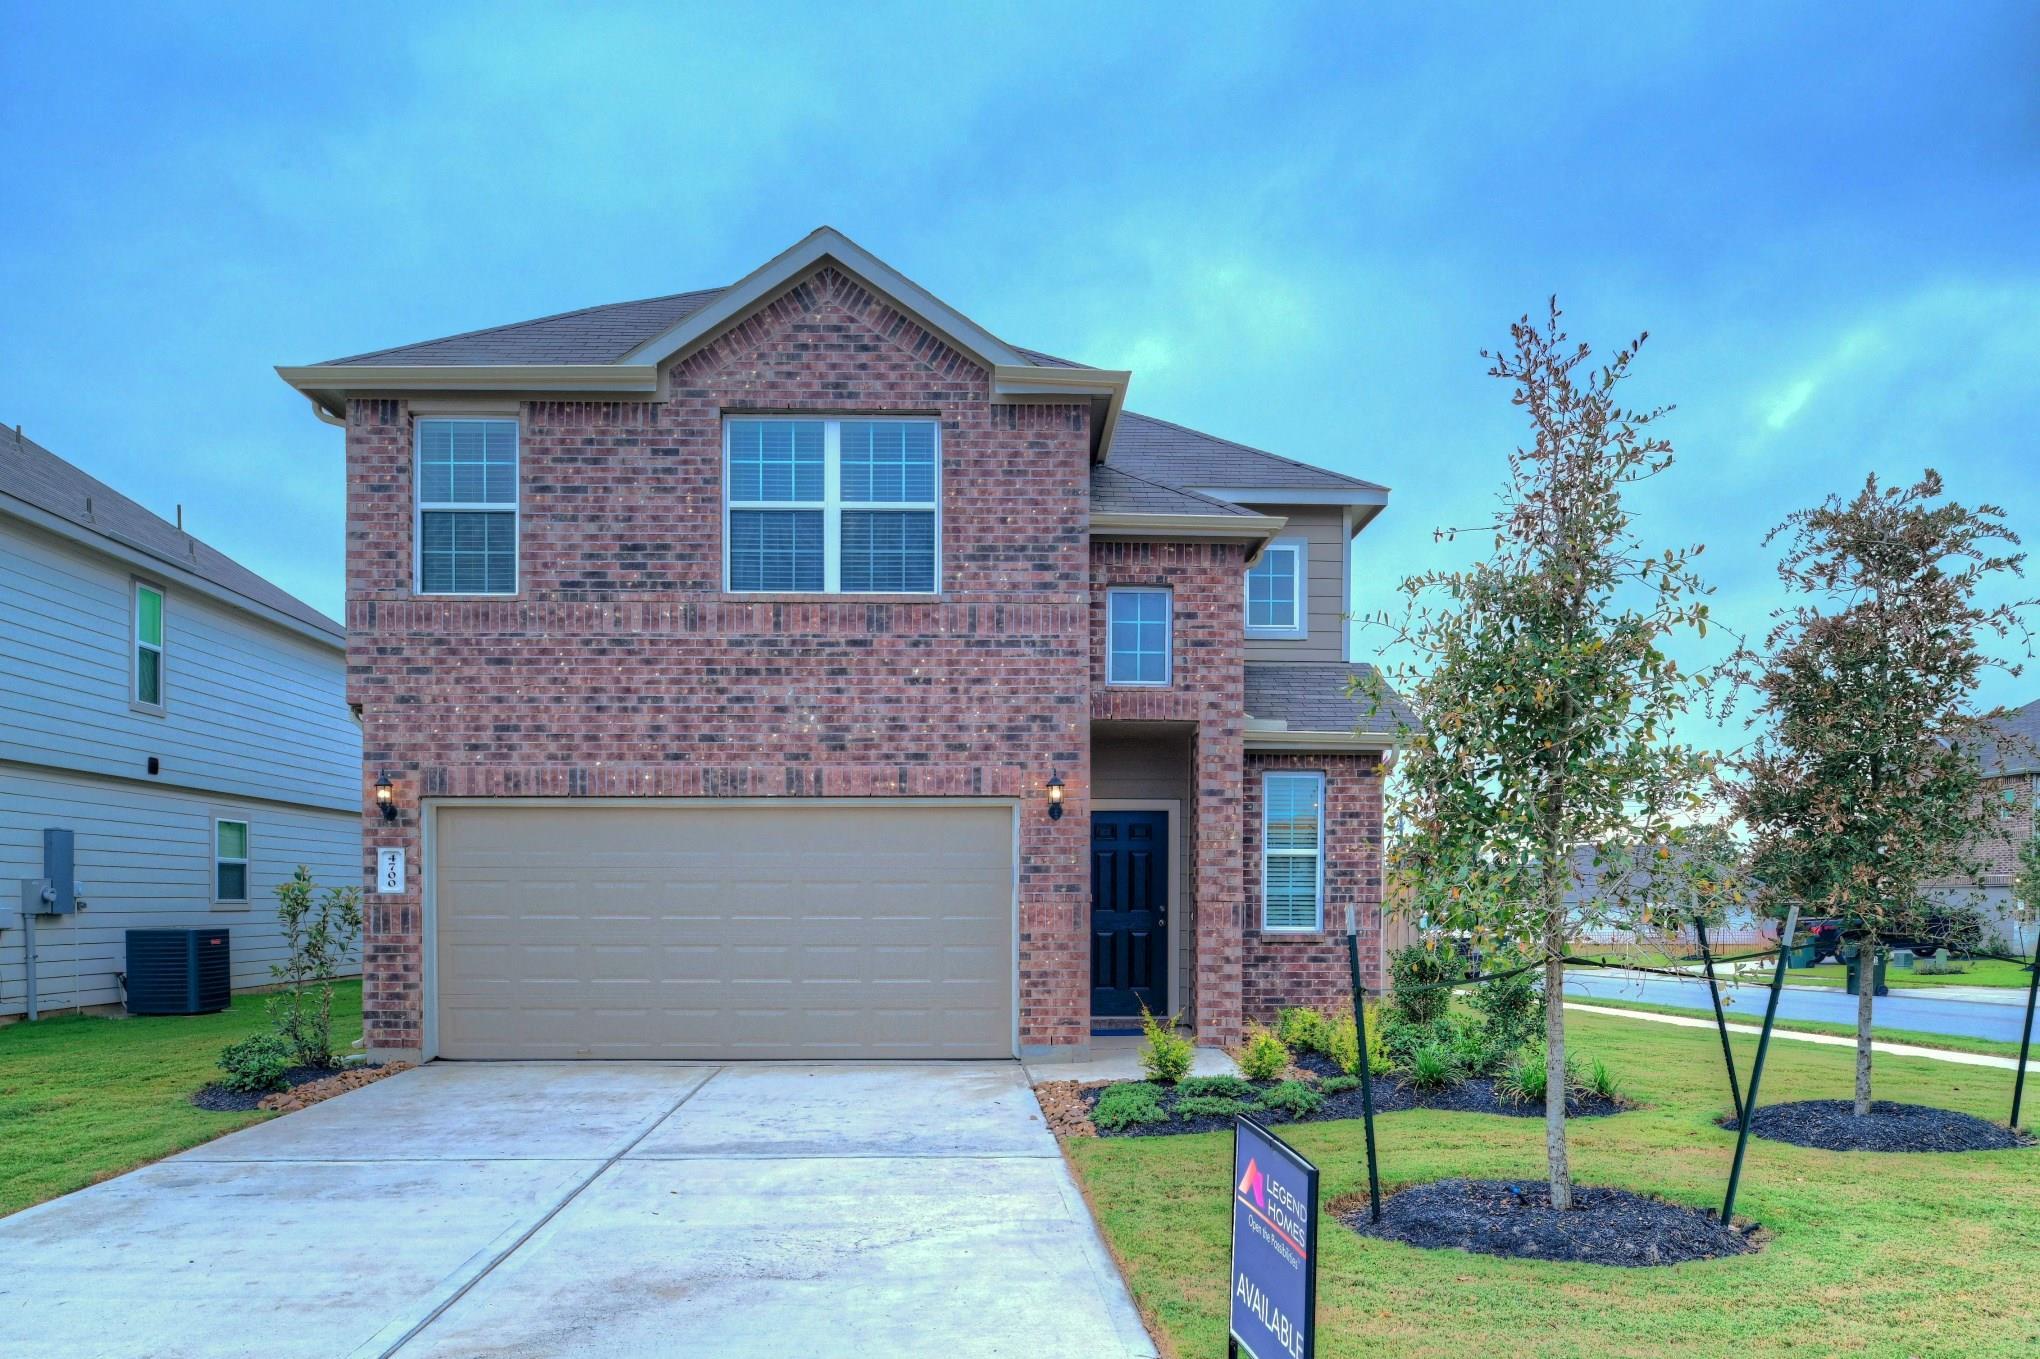 4700 Los Pines Way Property Photo - Bryan, TX real estate listing